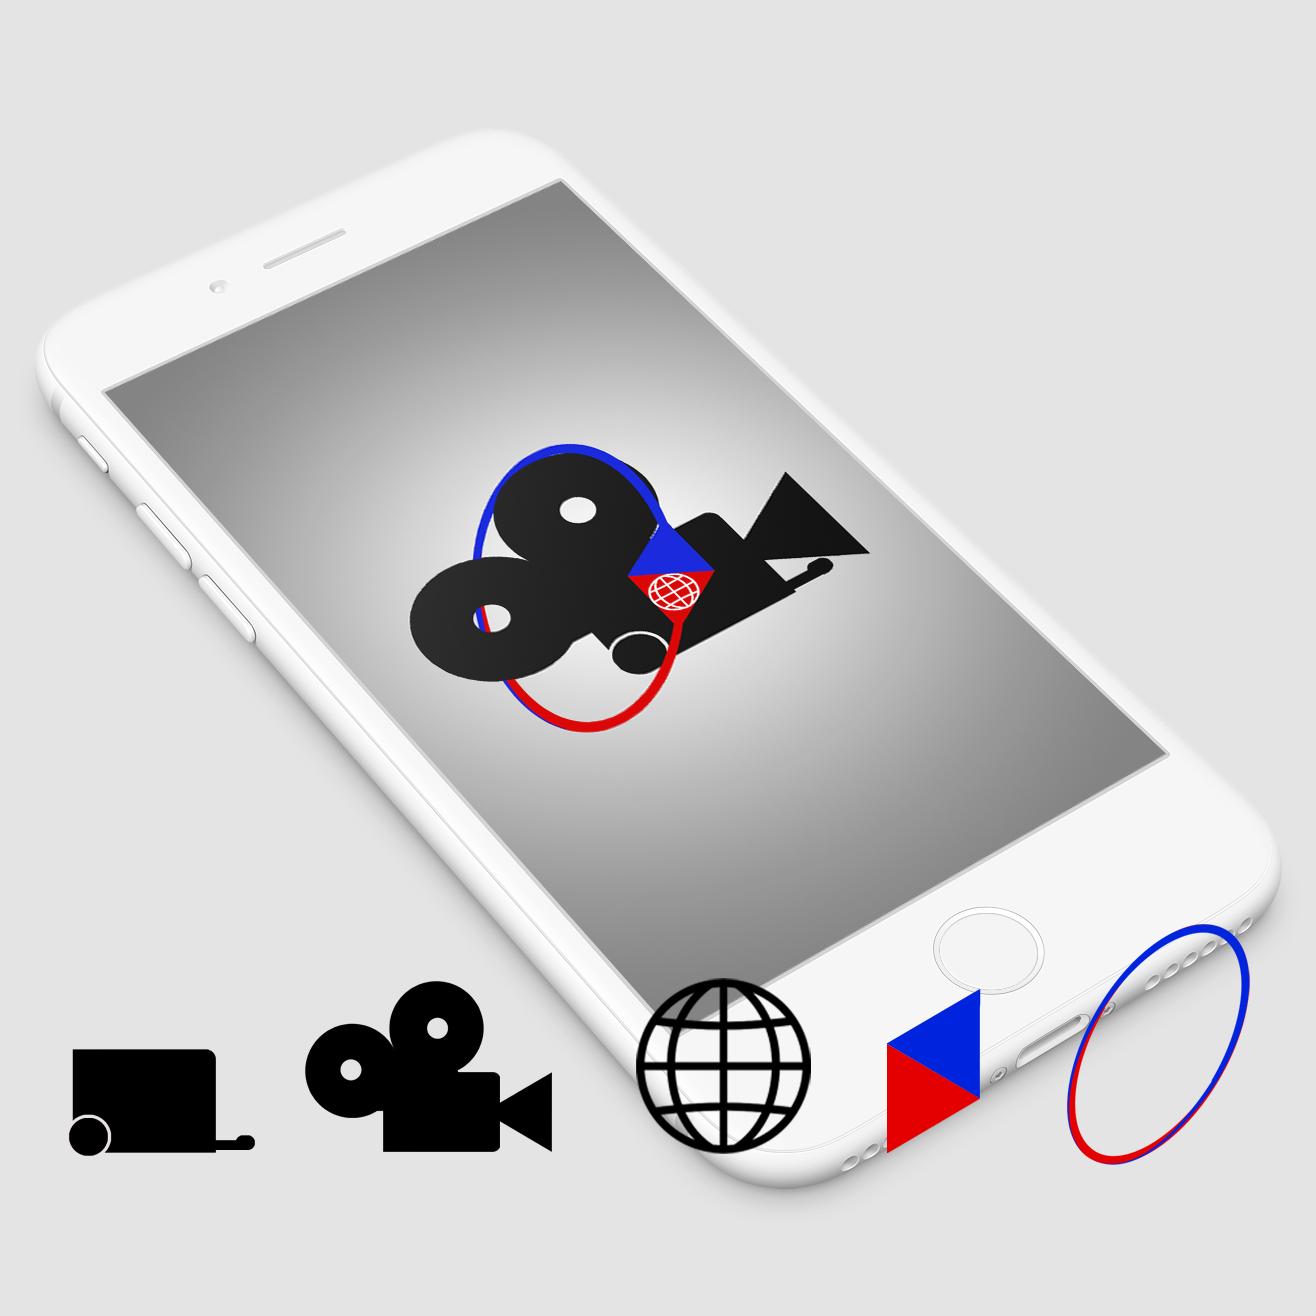 Разработка логотипа и иконки для Travel Video Platform фото f_5465c390359e3308.jpg